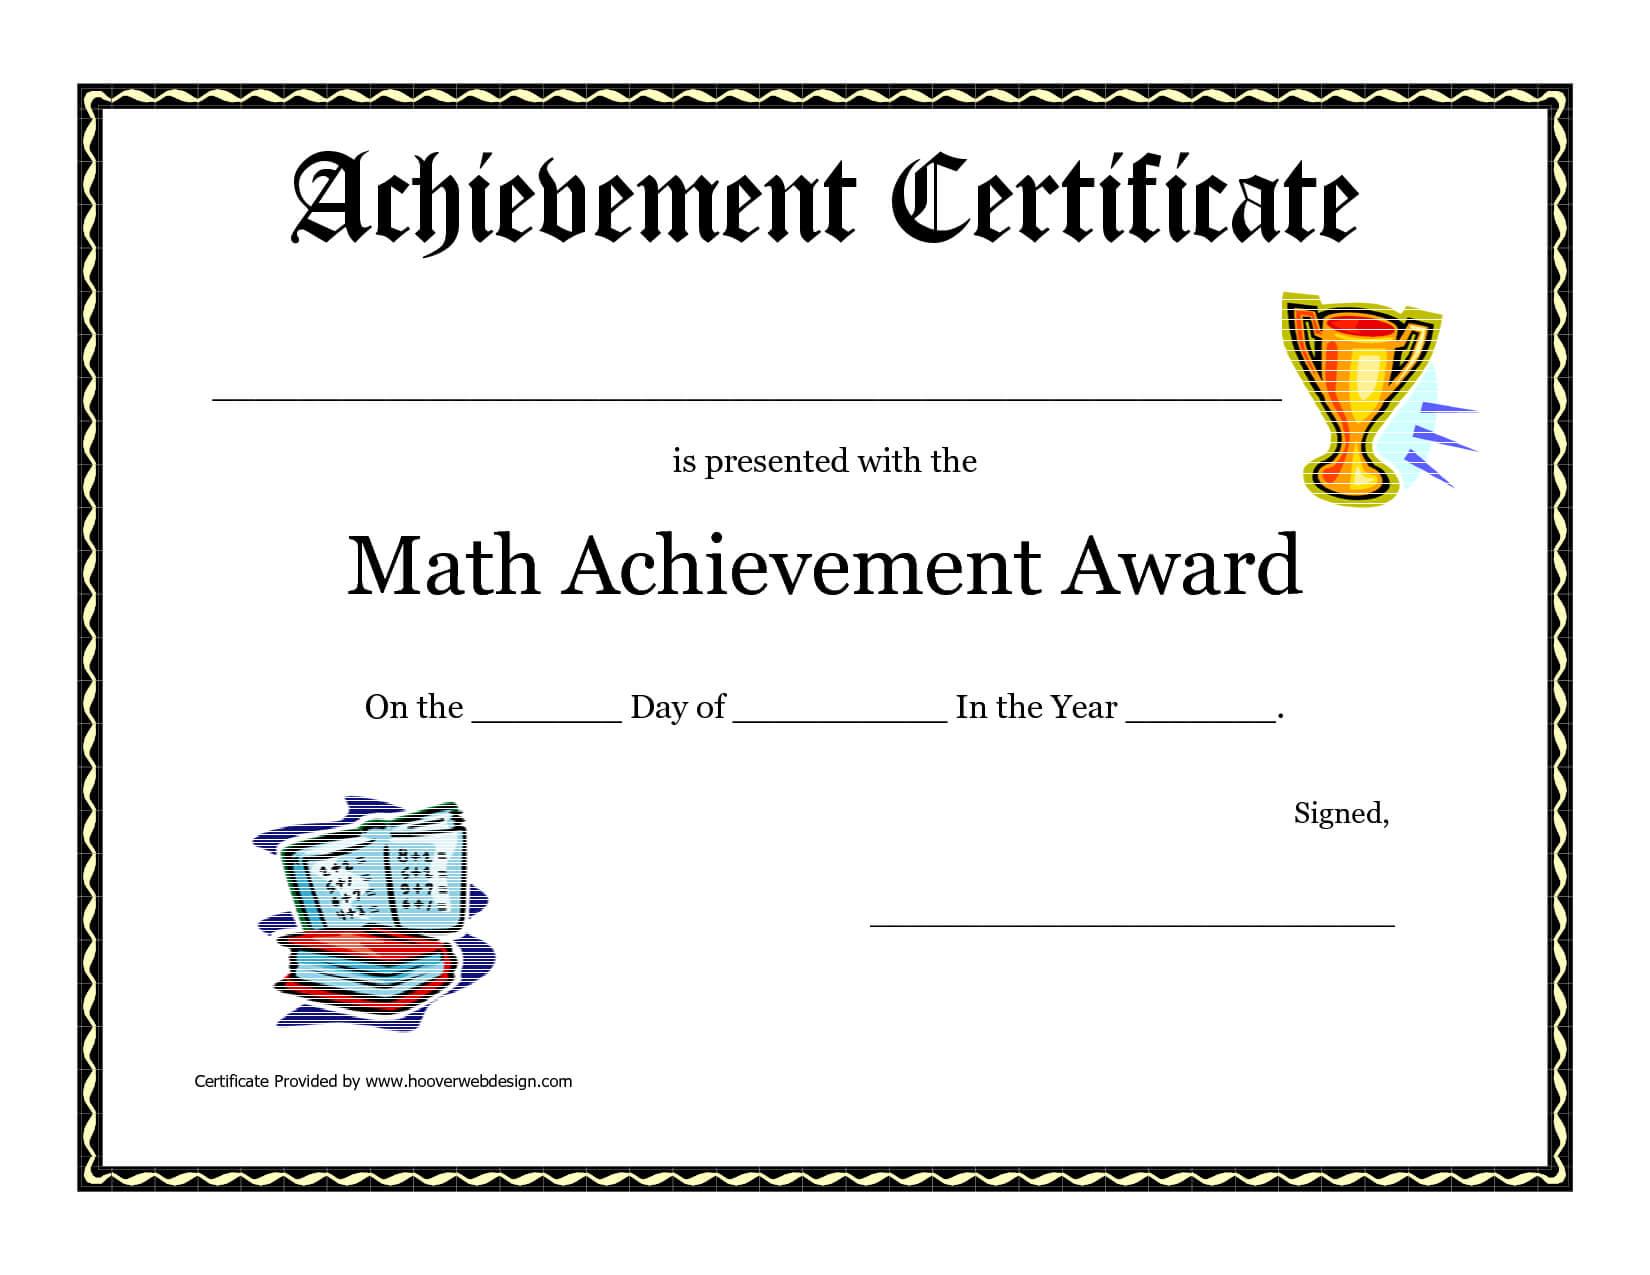 Math Achievement Award Printable Certificate Pdf | Math With Classroom Certificates Templates